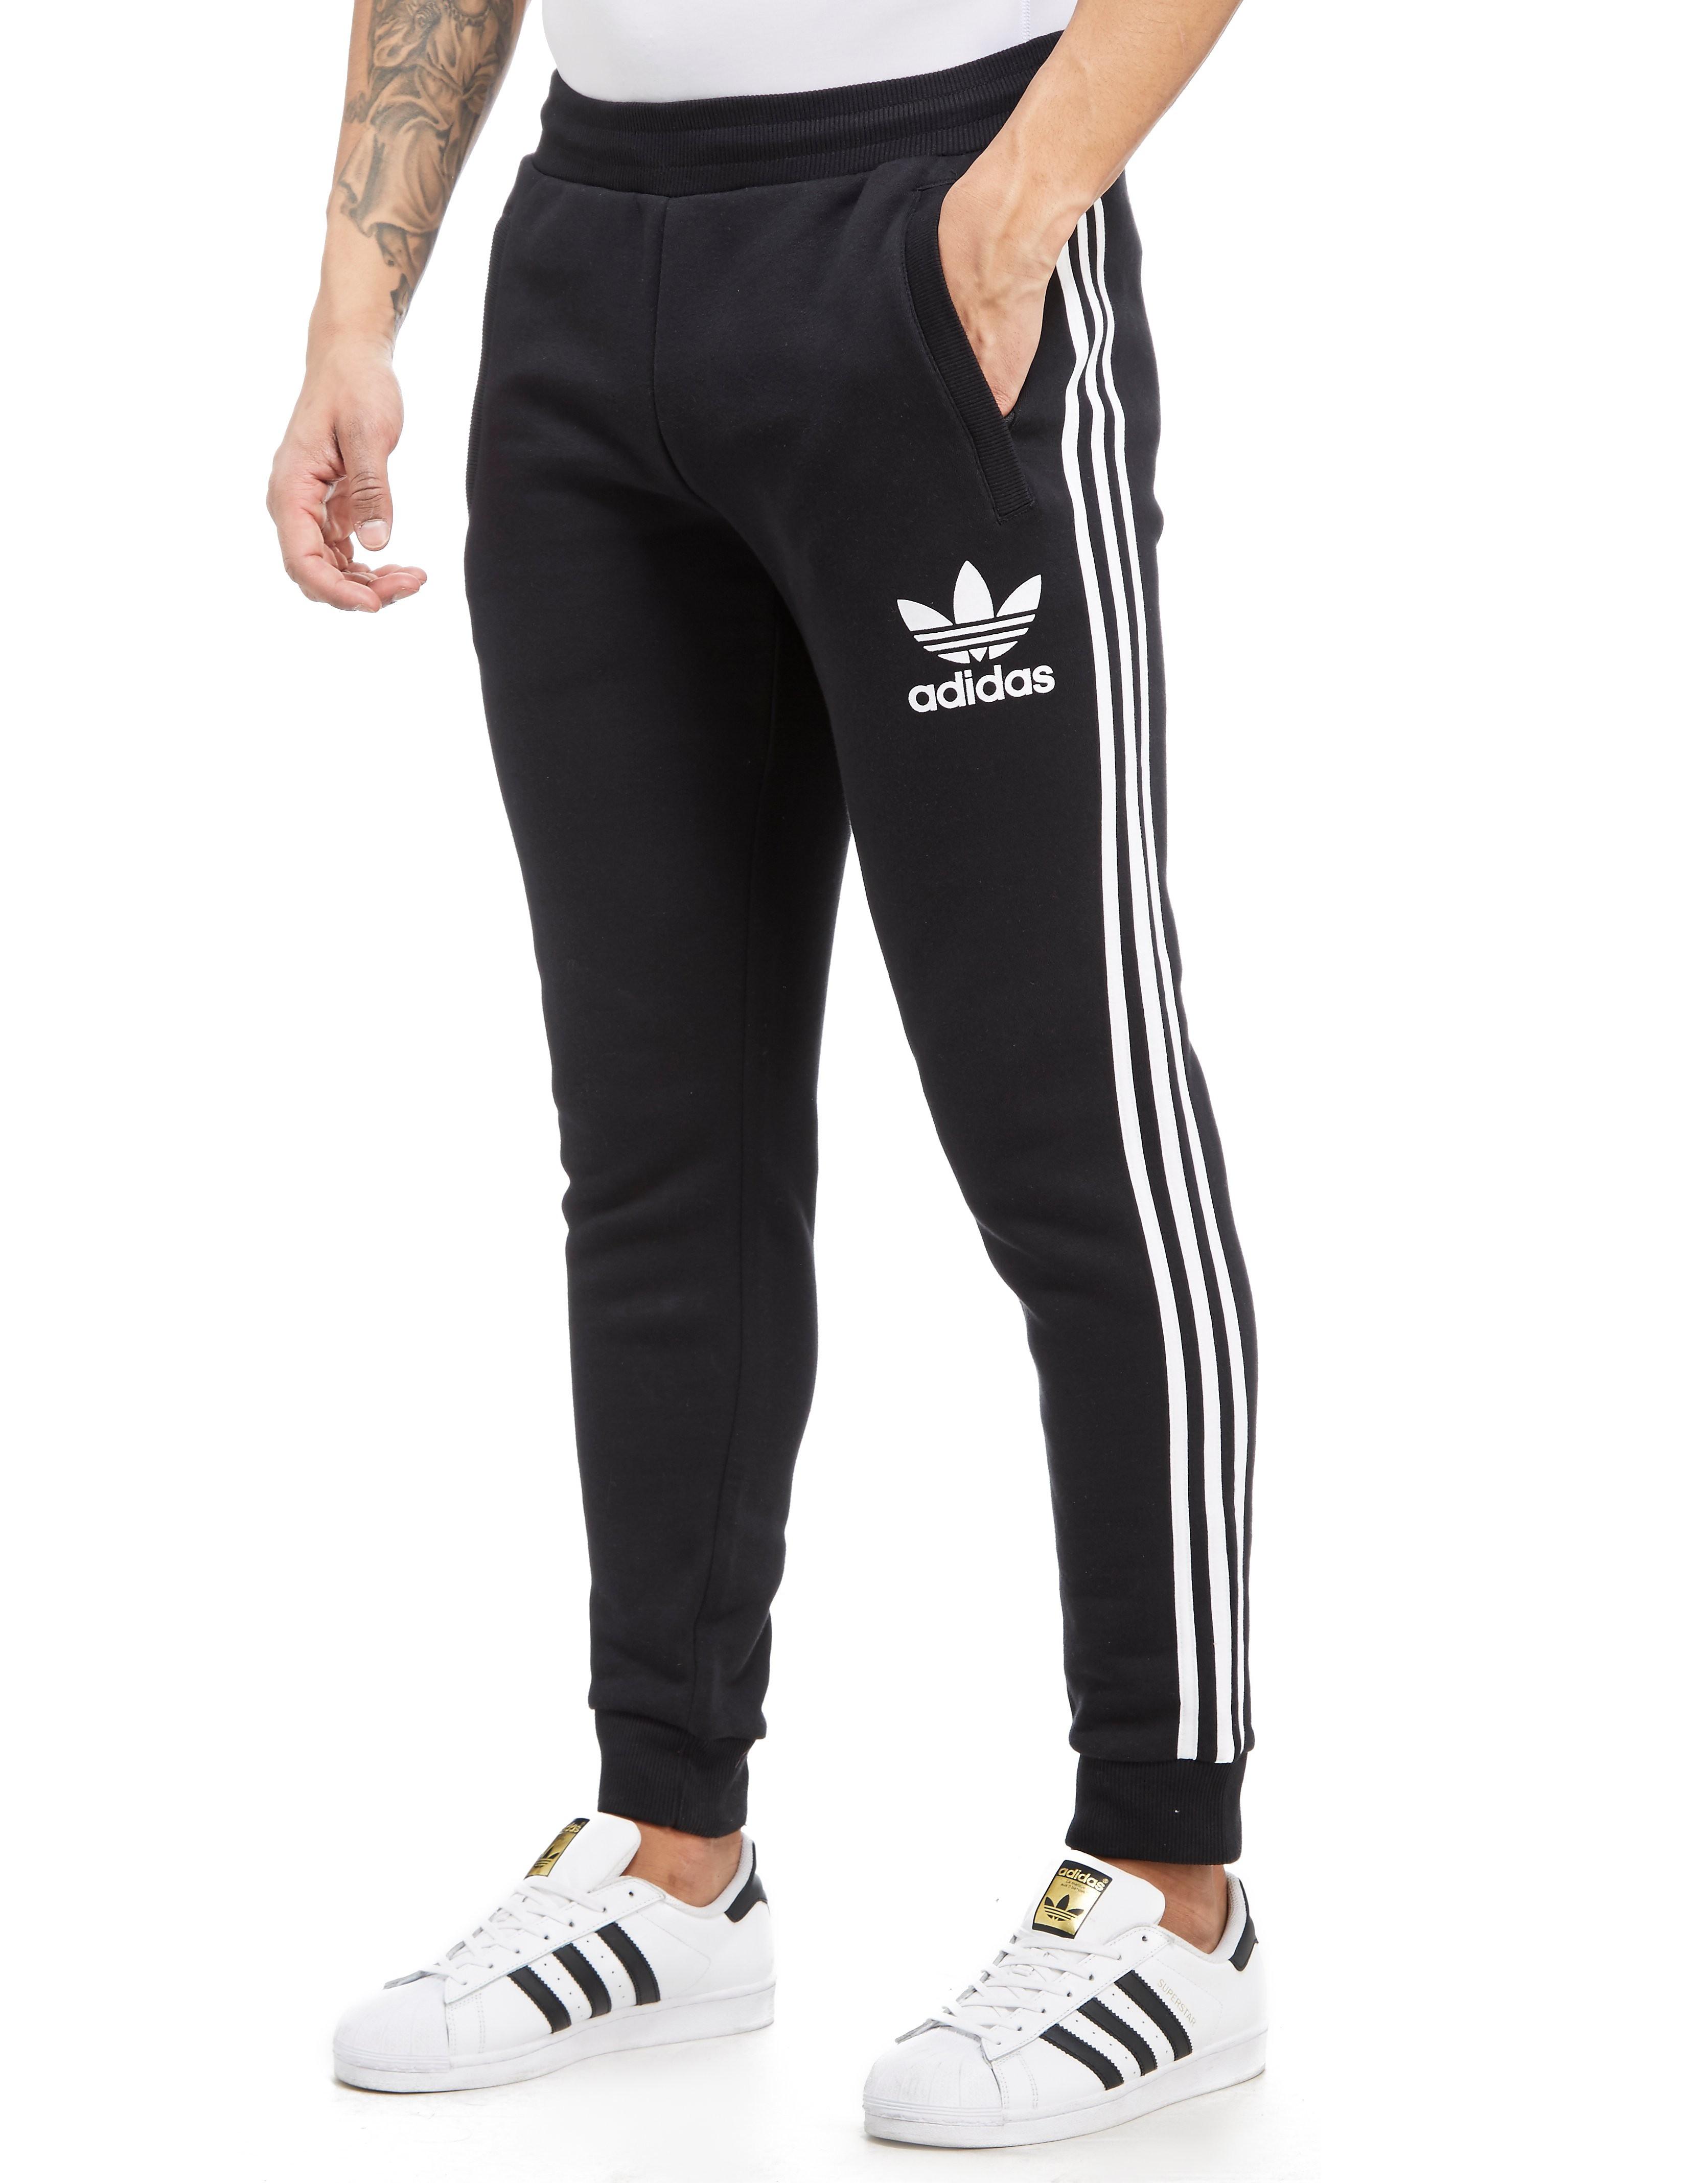 adidas Originals Pantalon de survêtement California Homme